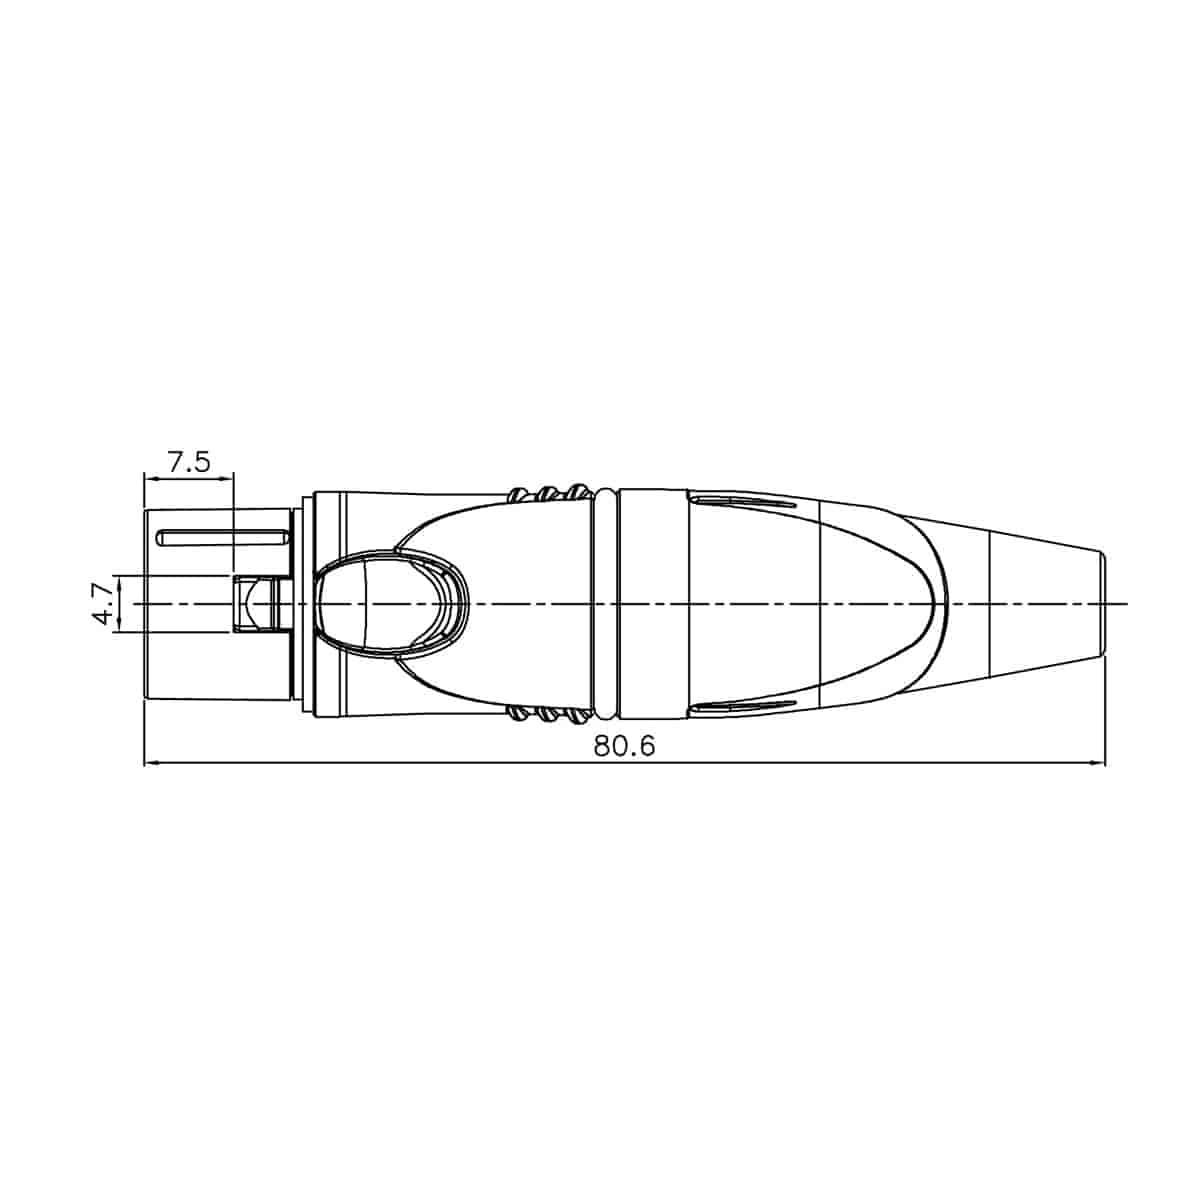 Enova Outdoor Xlr Kabelbuchse Ip67 5 Pol Lotanschluss